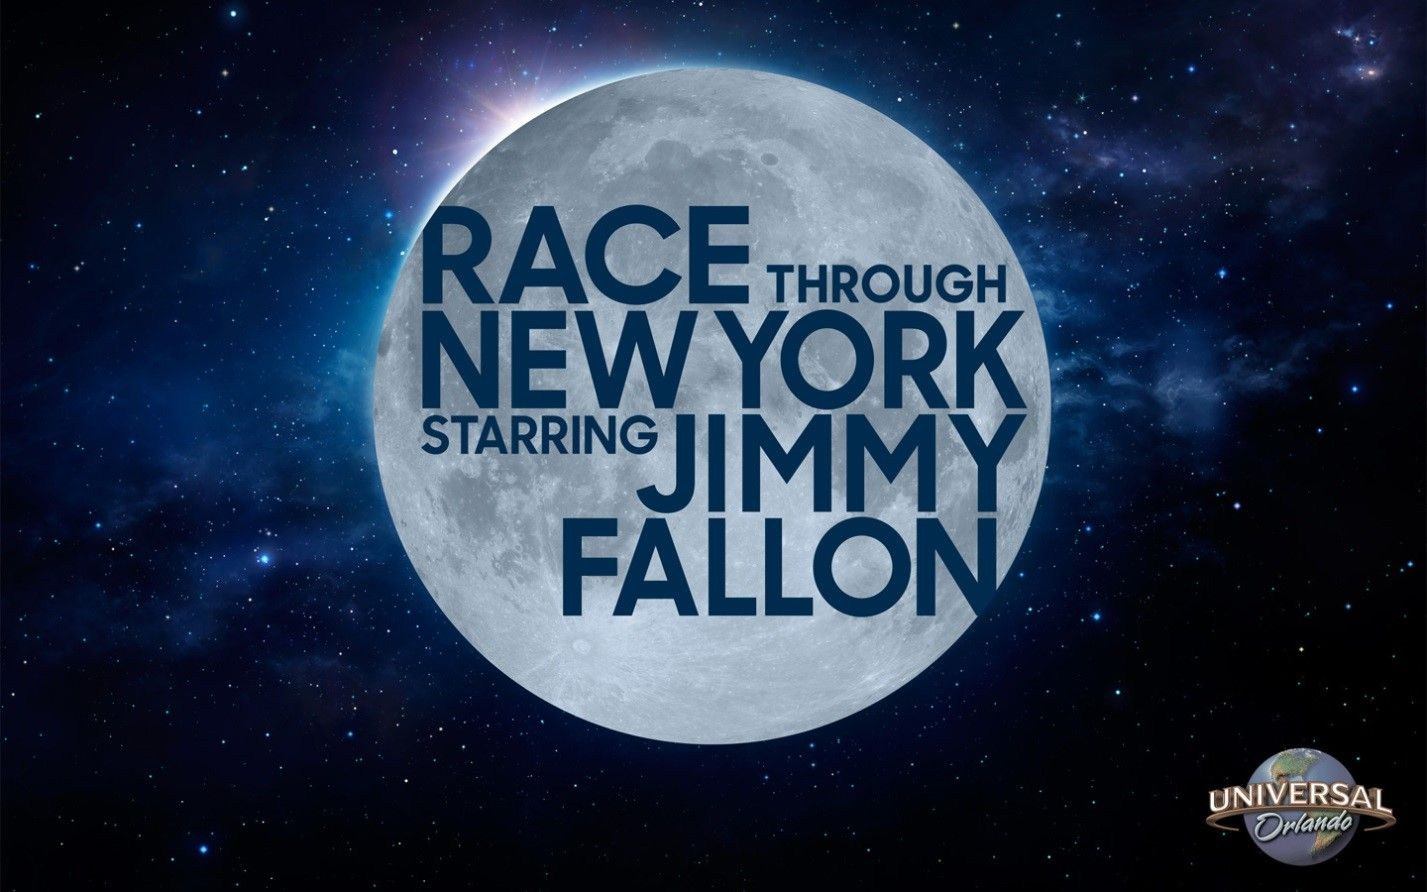 Jimmy Fallon ride